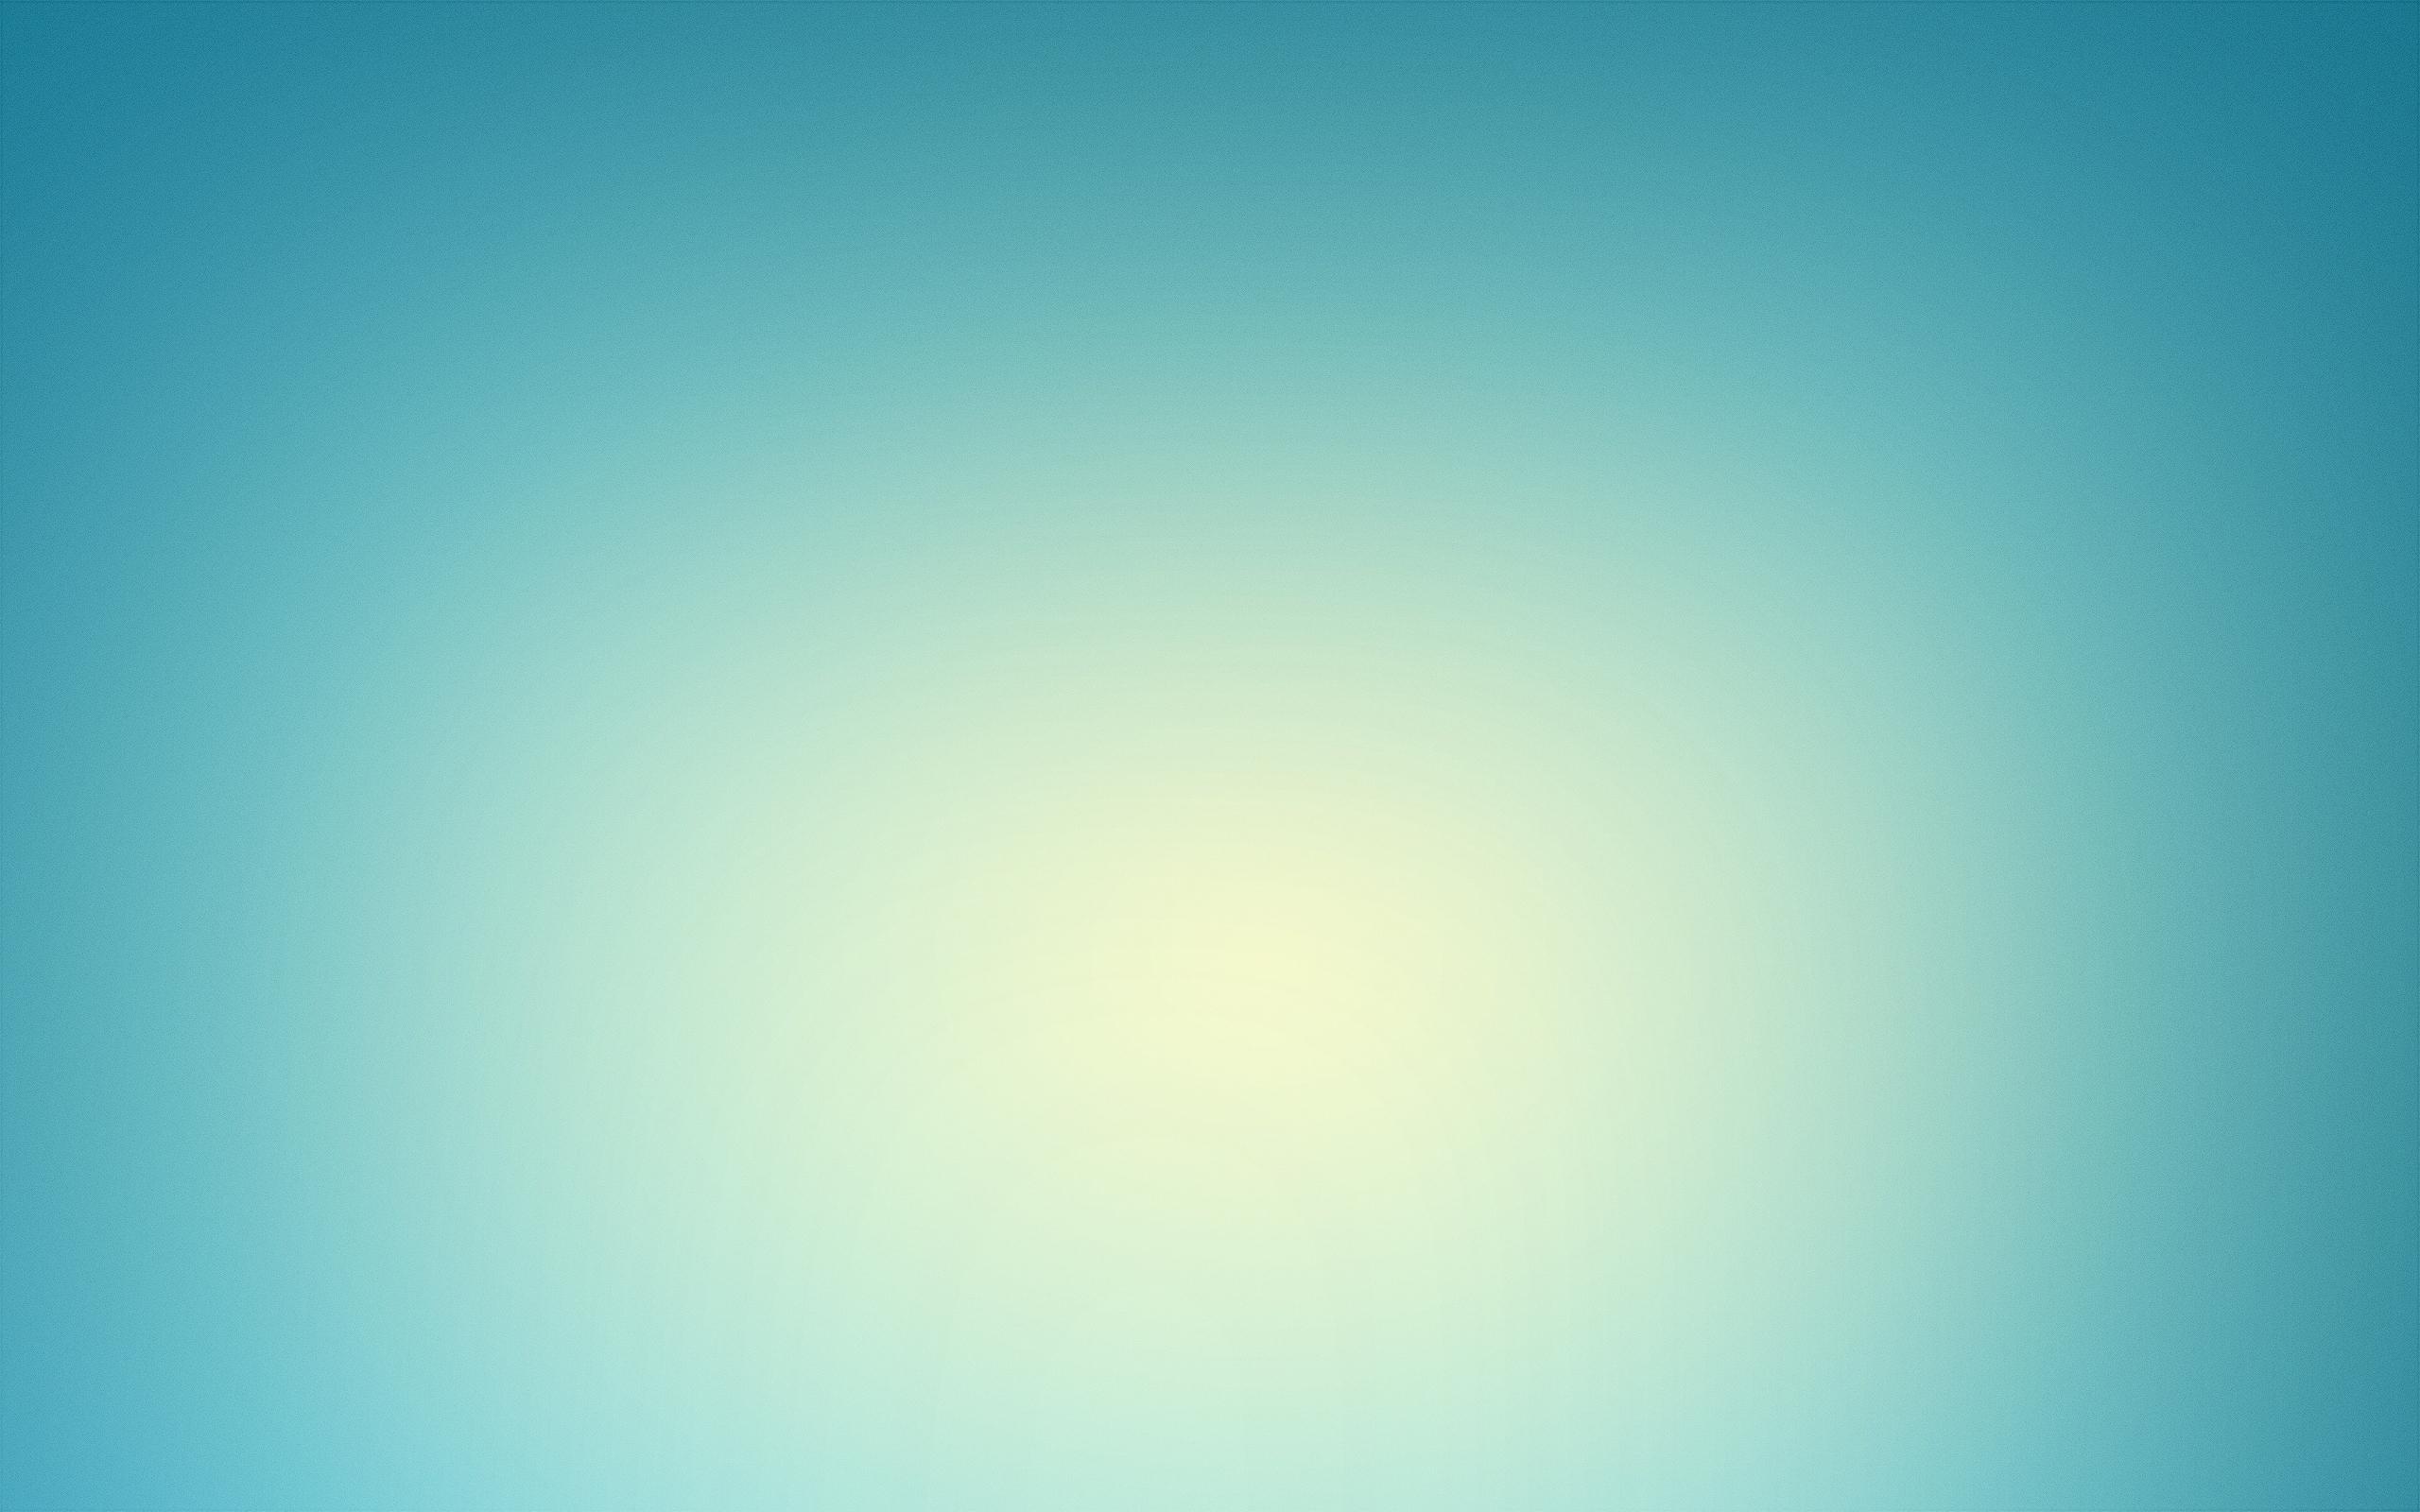 Light Blue Best Abstract Wallpaper Hd 5192 Hd Wallpapers Background 2560x1600